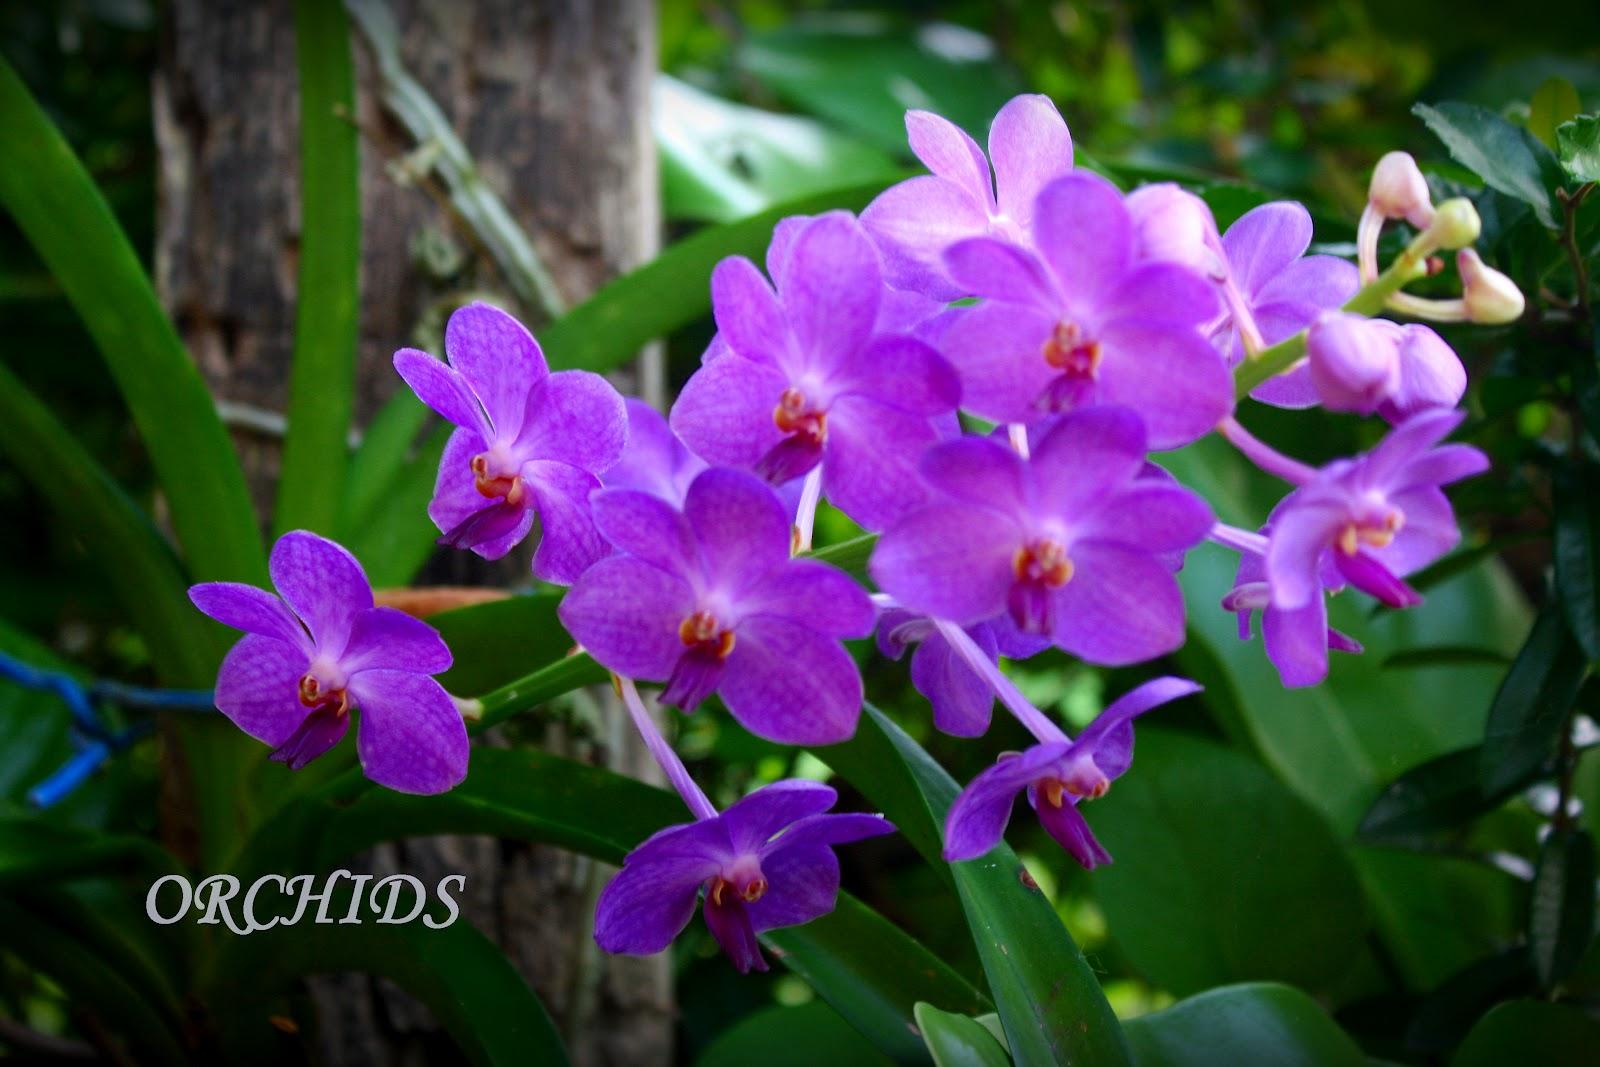 starlight photo koleksi bunga